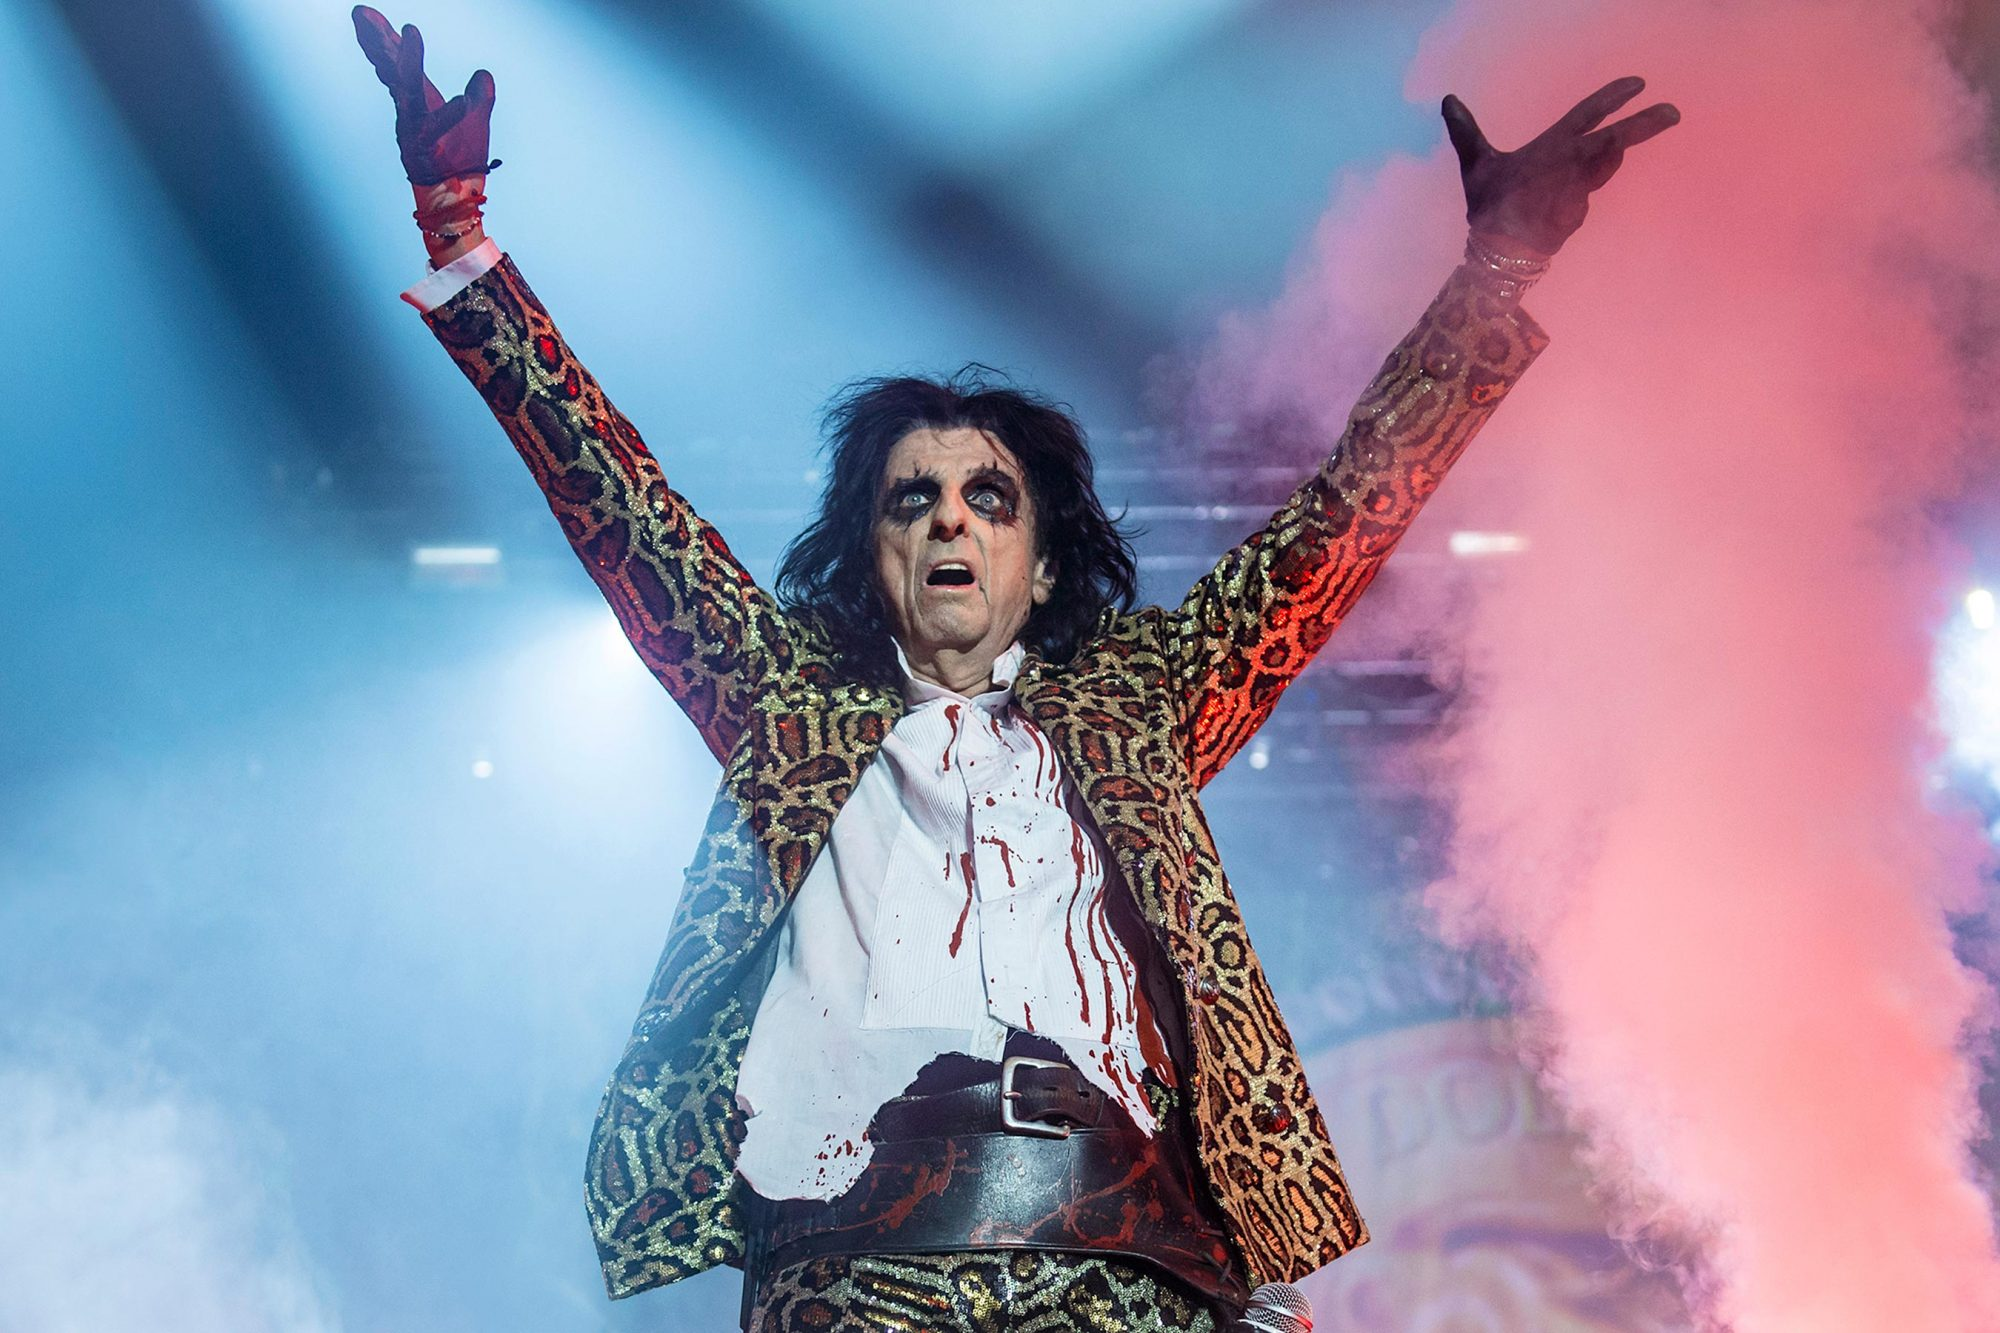 Alice Cooper Performs At Wembley Arena